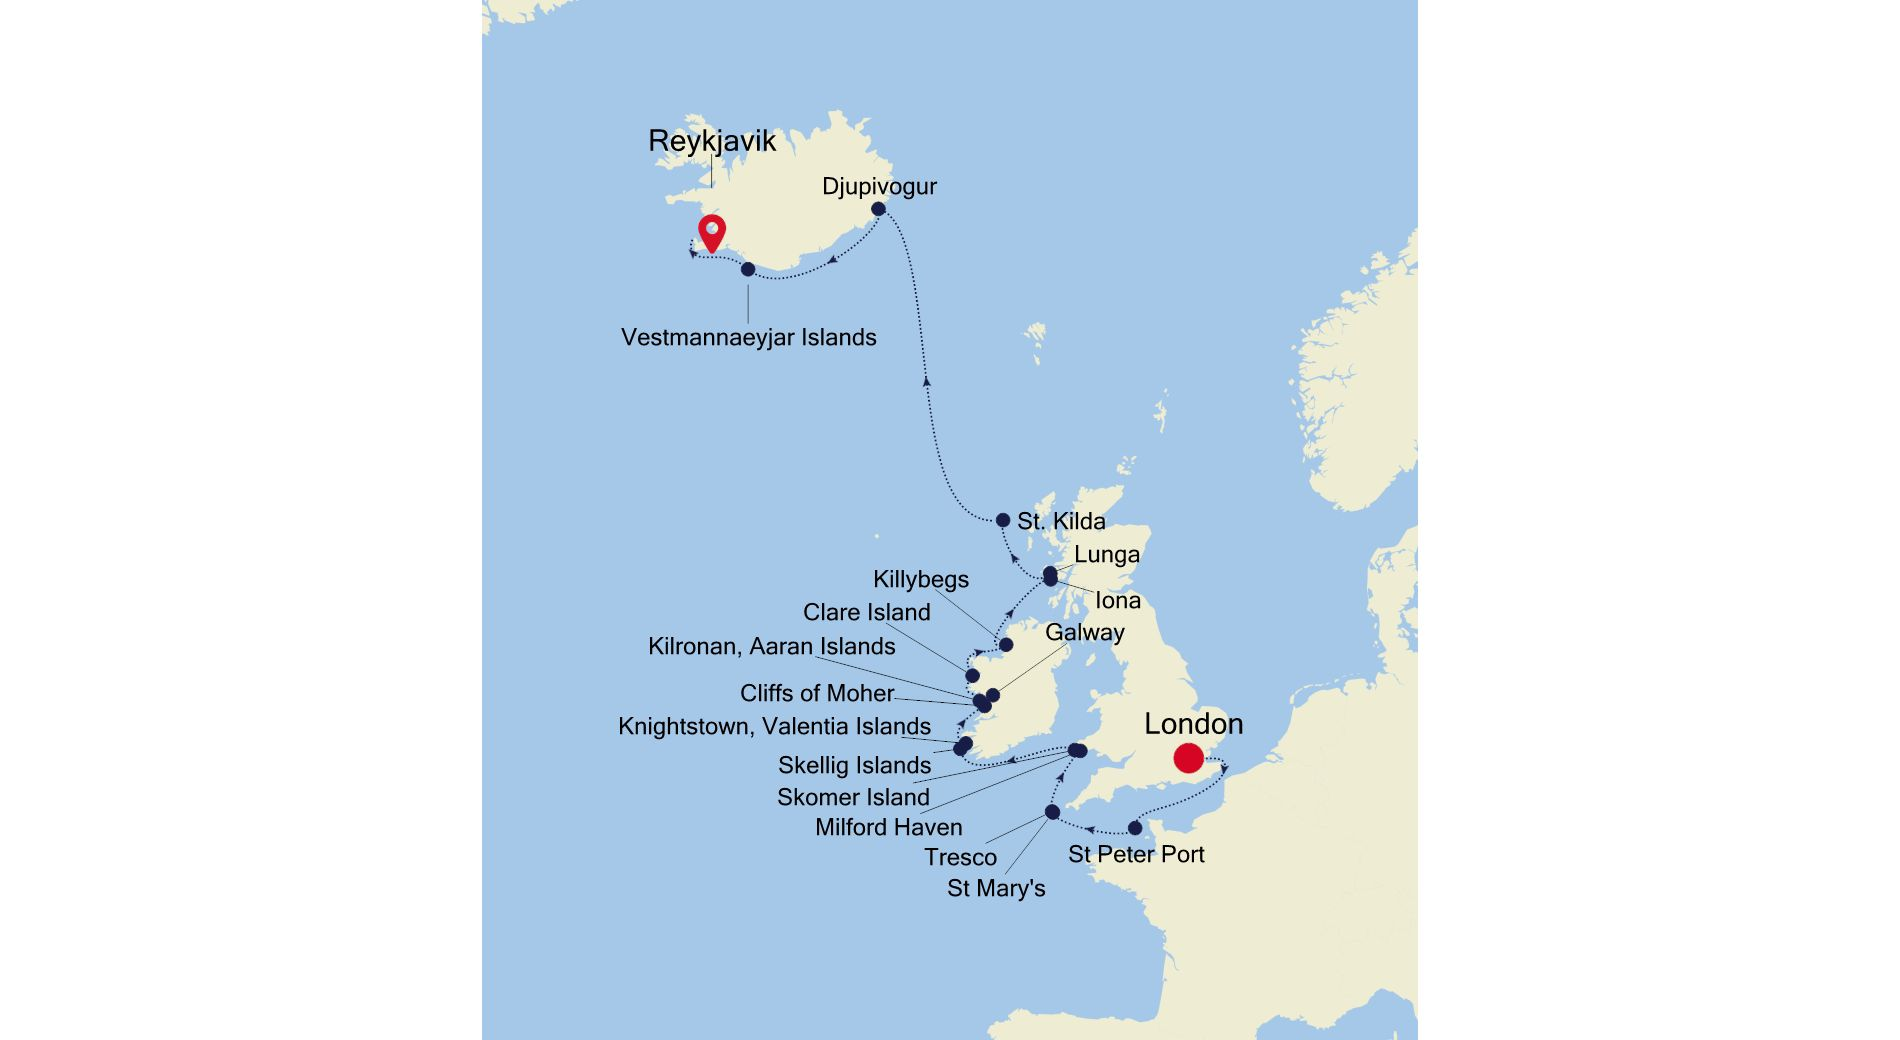 WI210614014 - London to Reykjavik